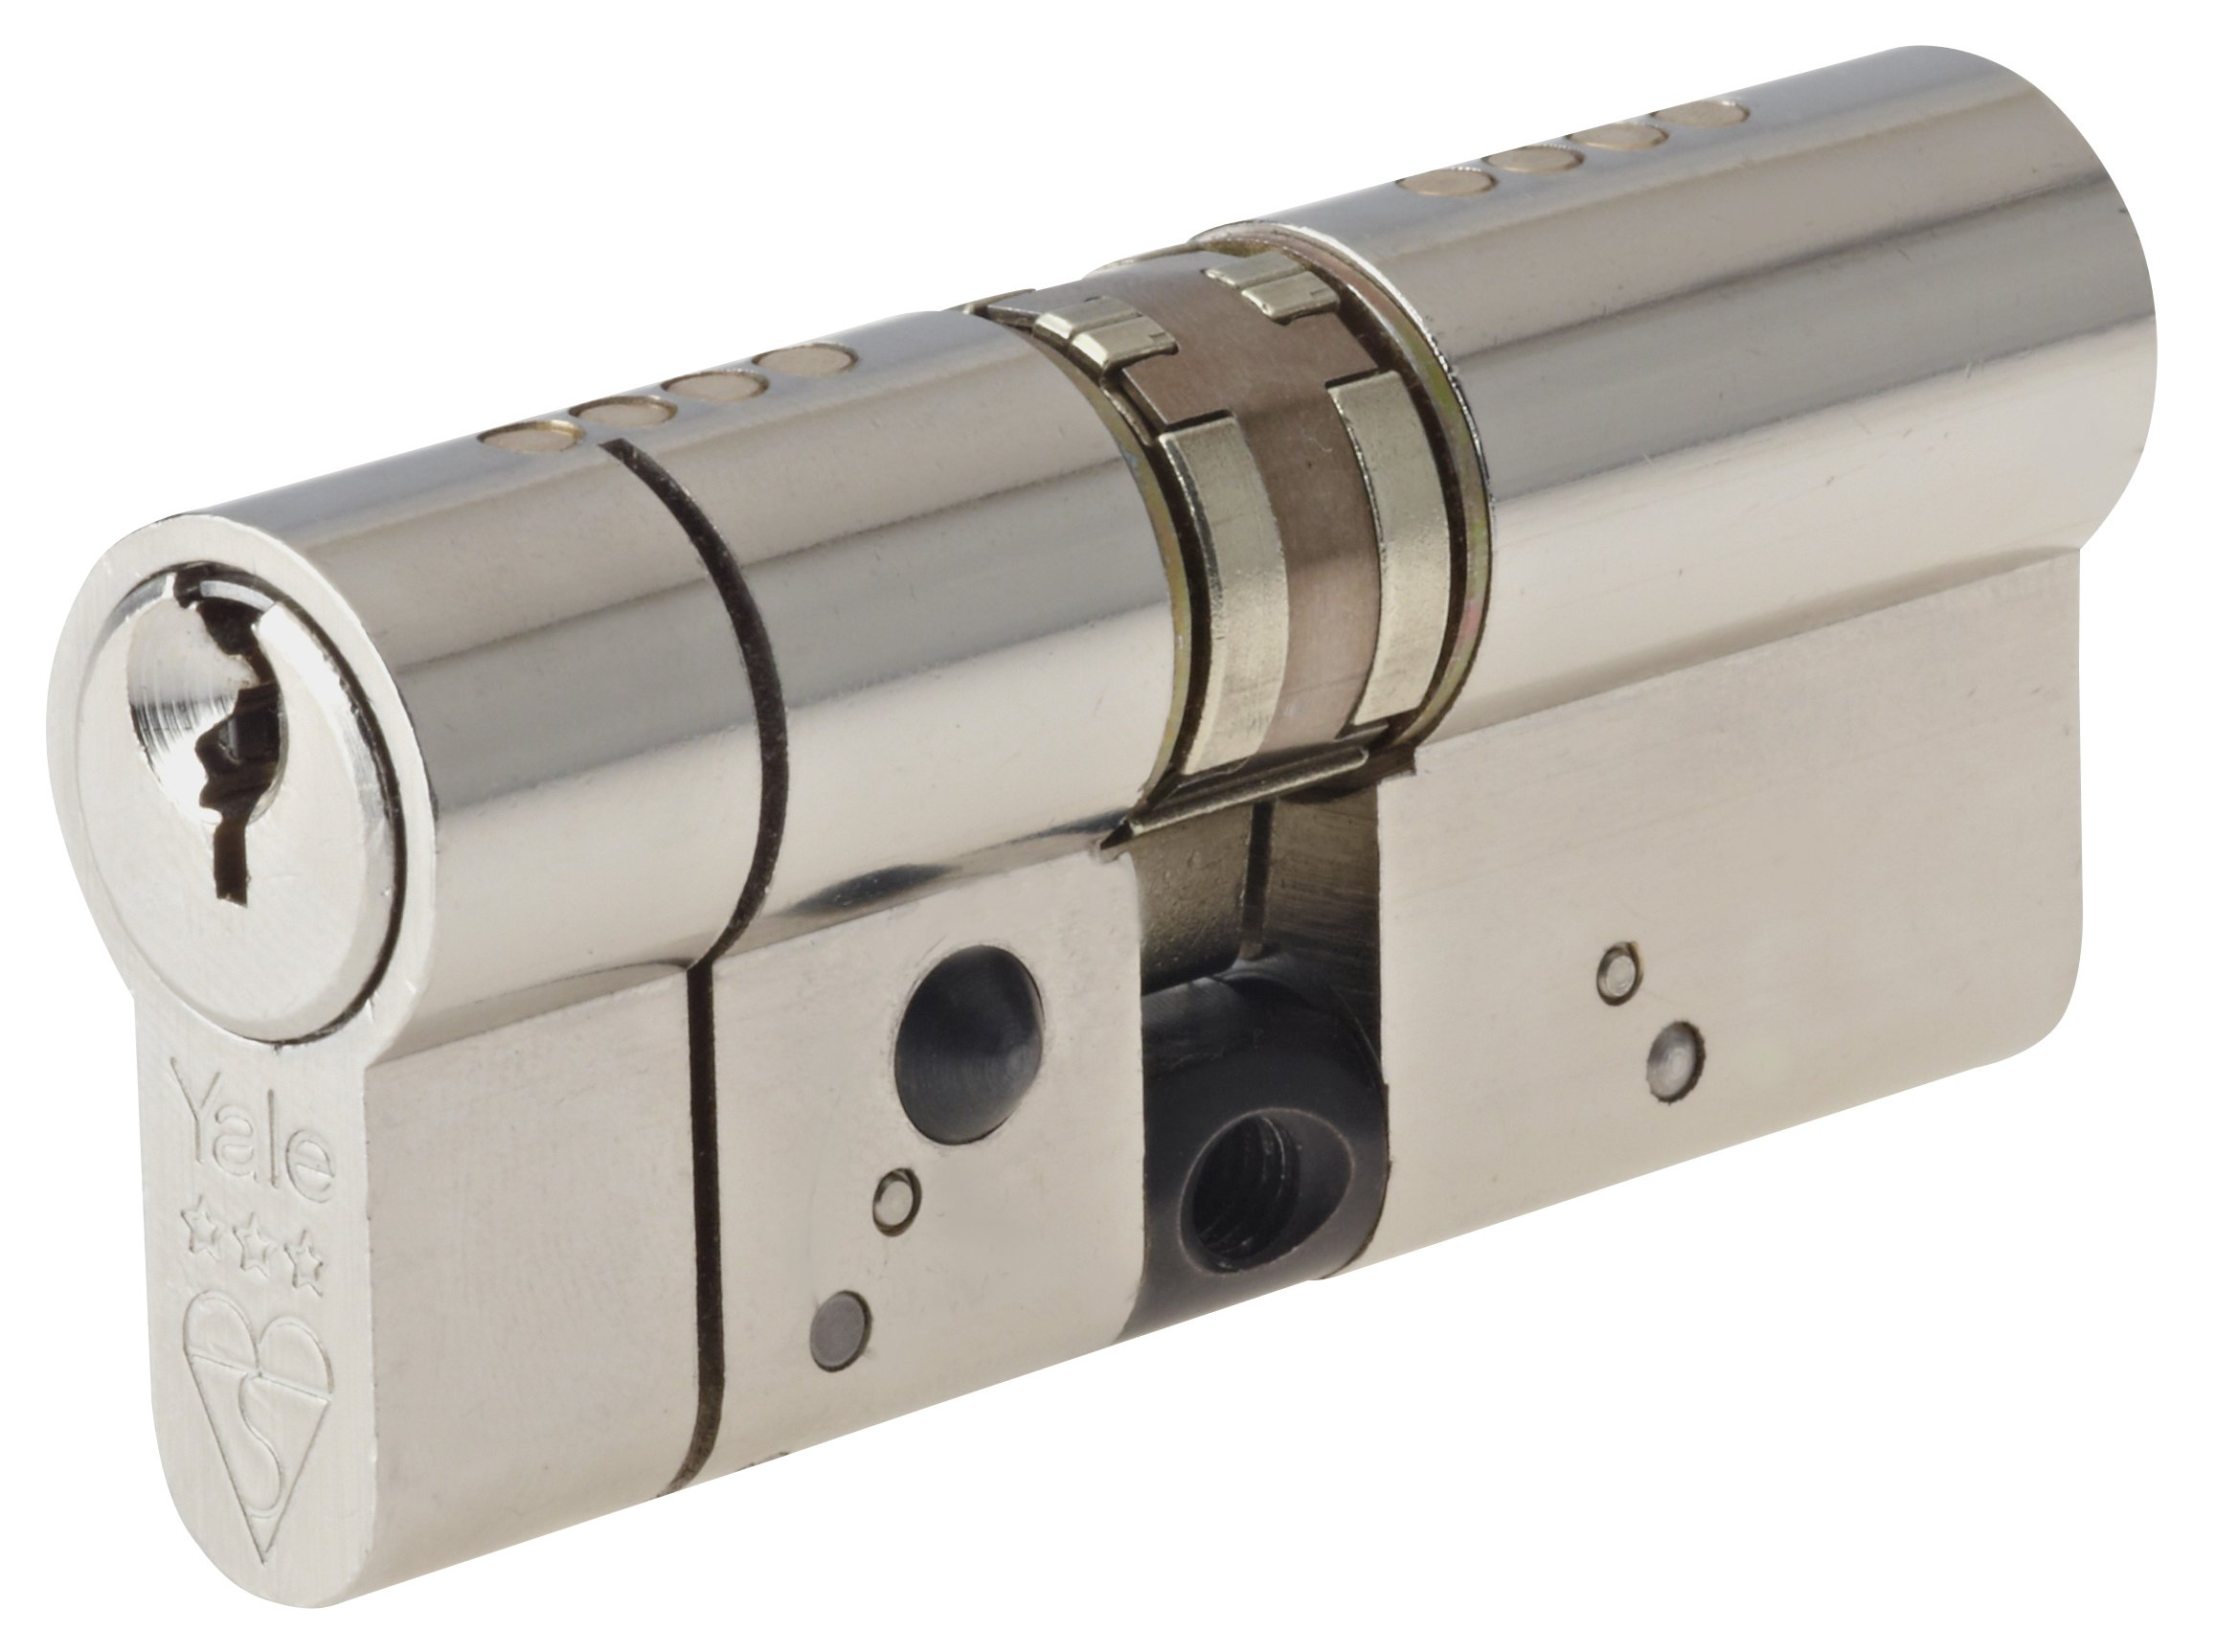 Yale Locks Anti-Snap Platinum Euro Cylinder 40/40 (80mm) Bright Nickel